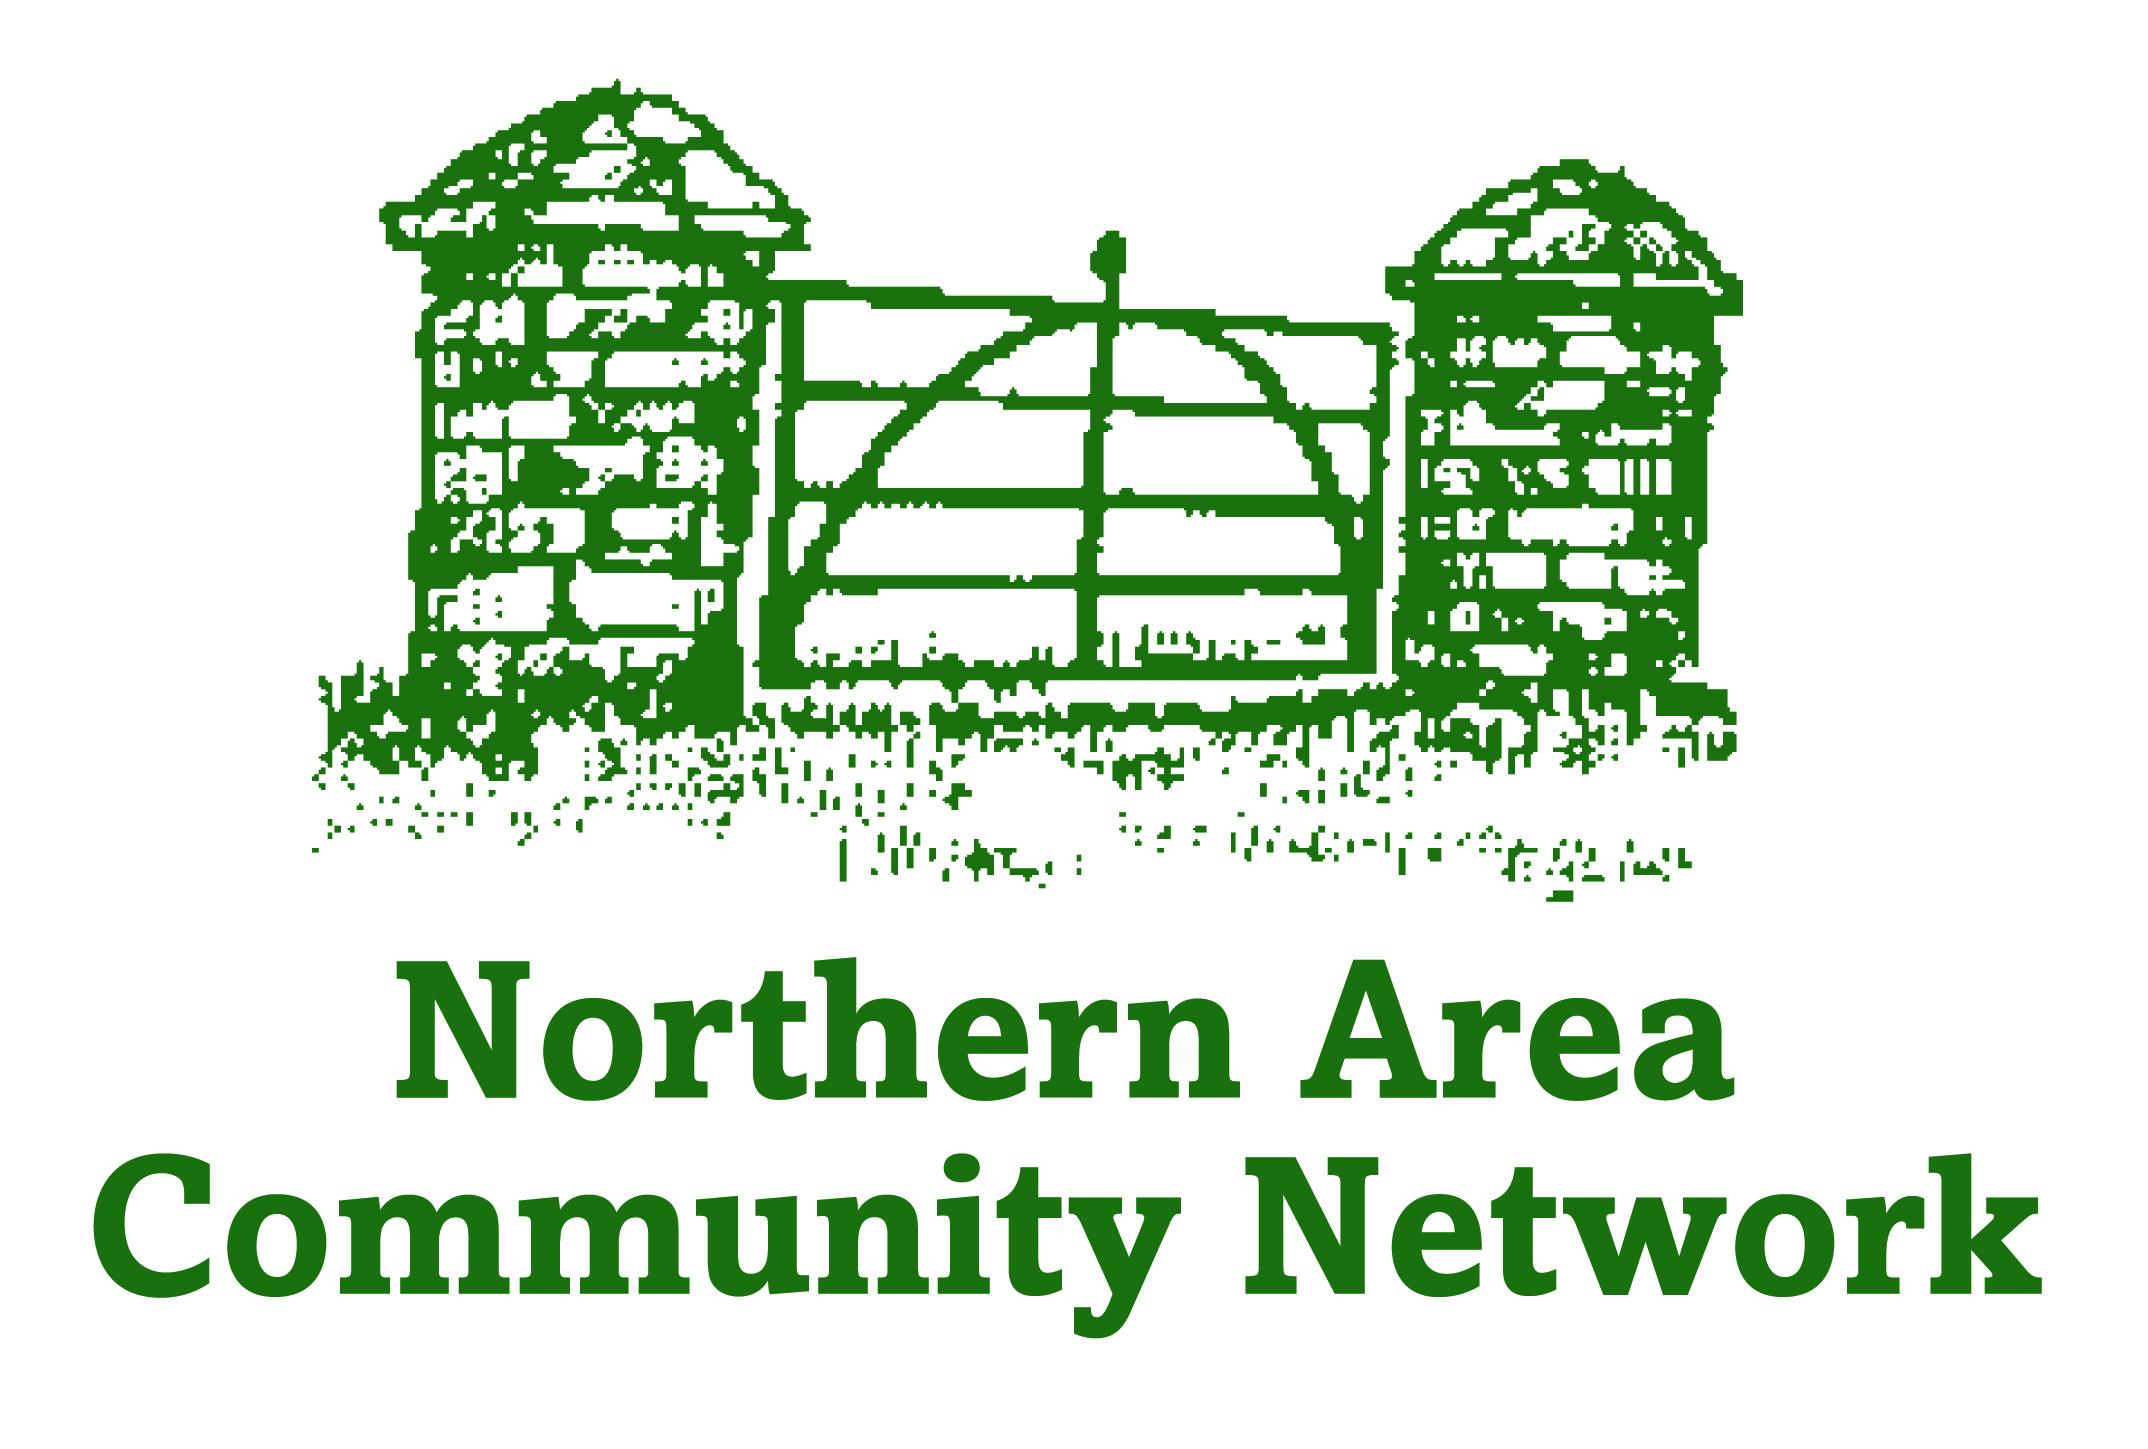 Northern Area Community Network | NICVA